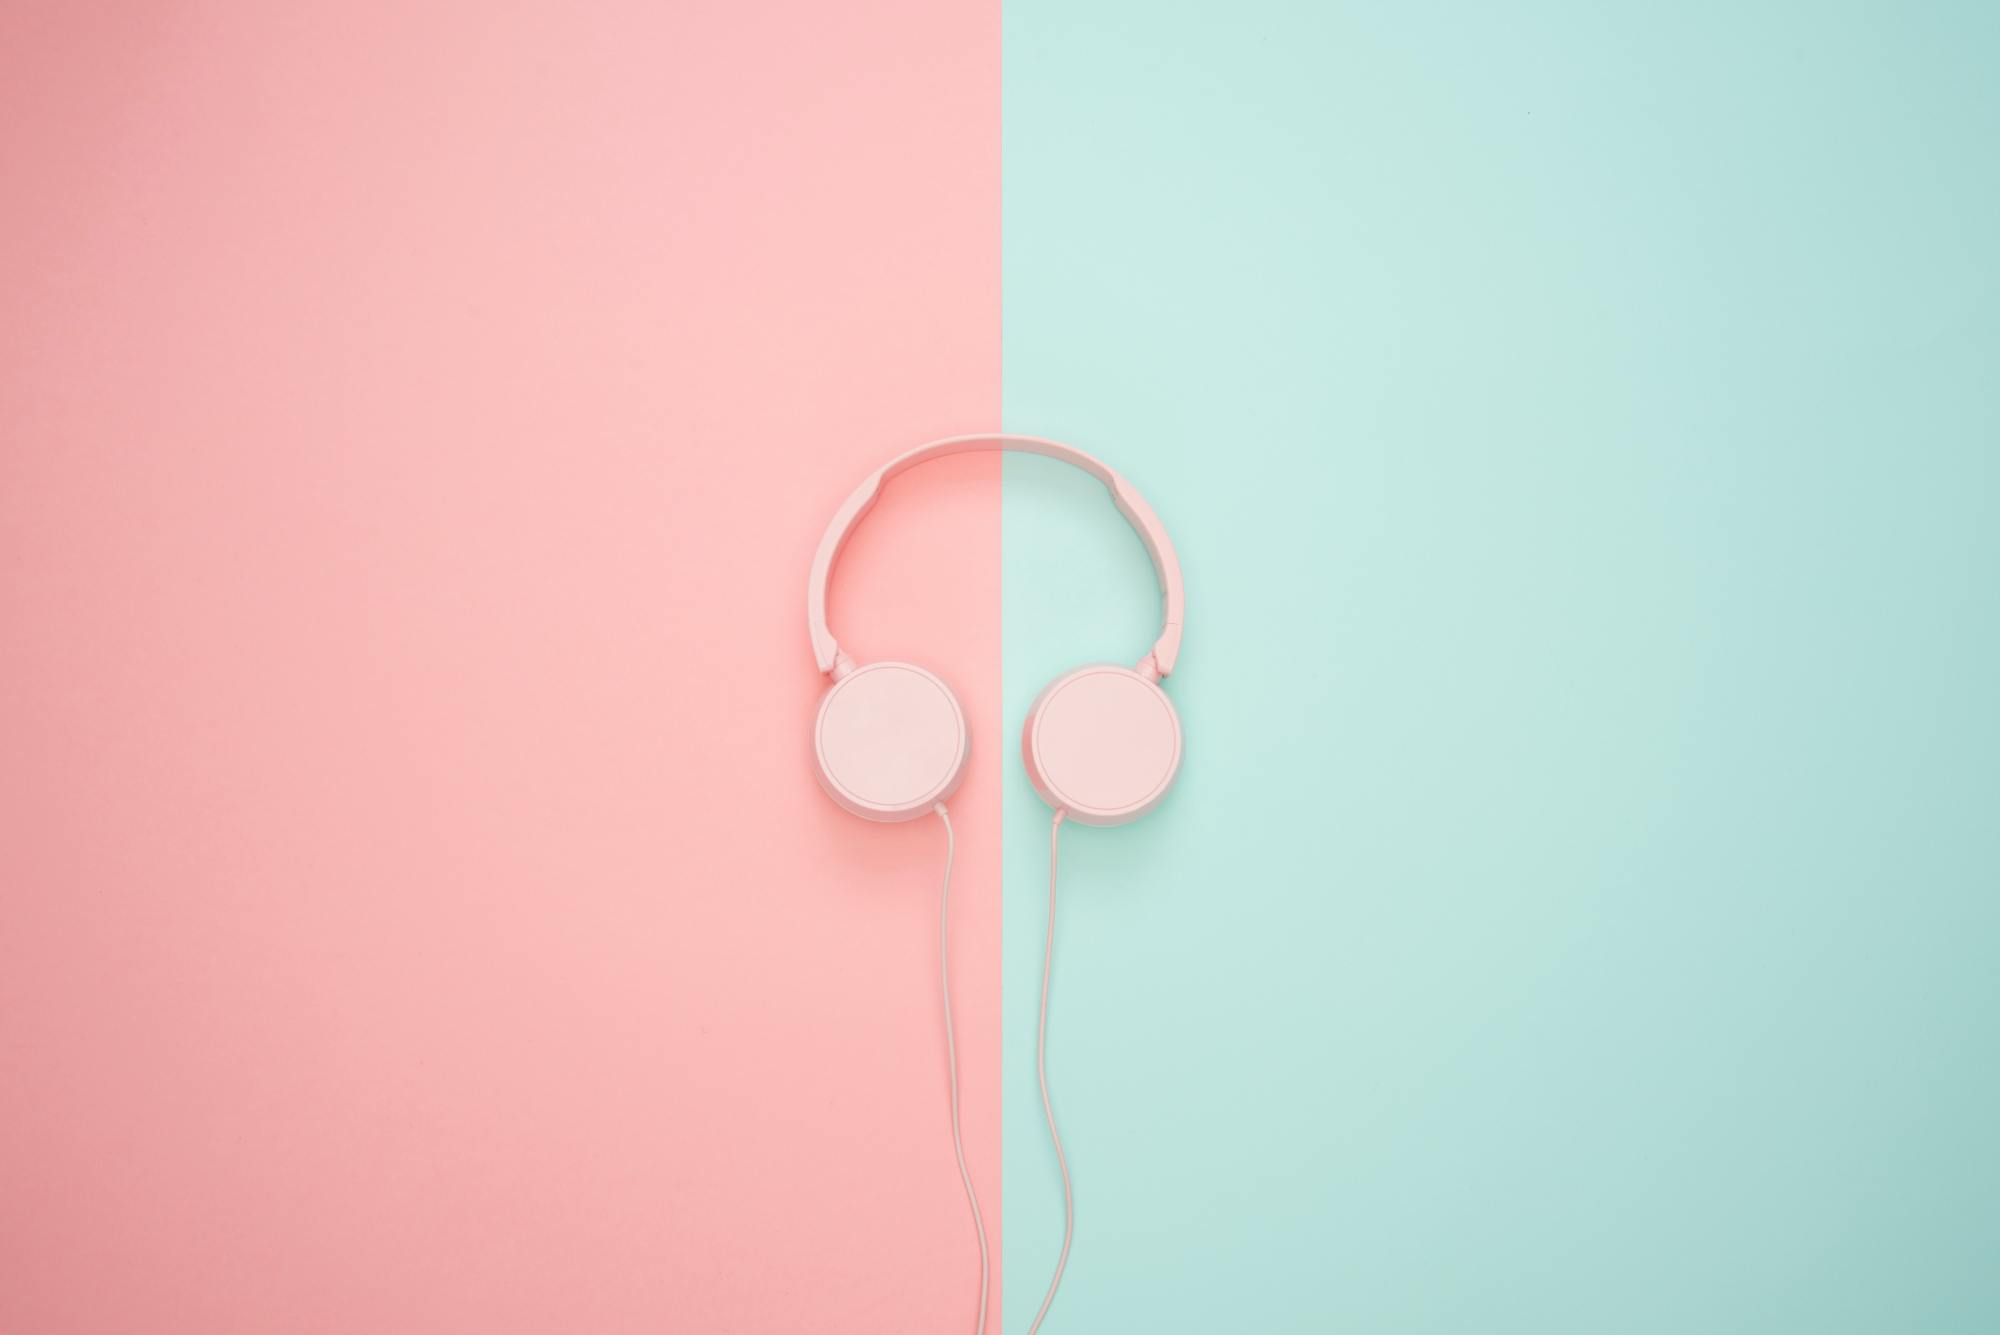 Pink/blue headphones